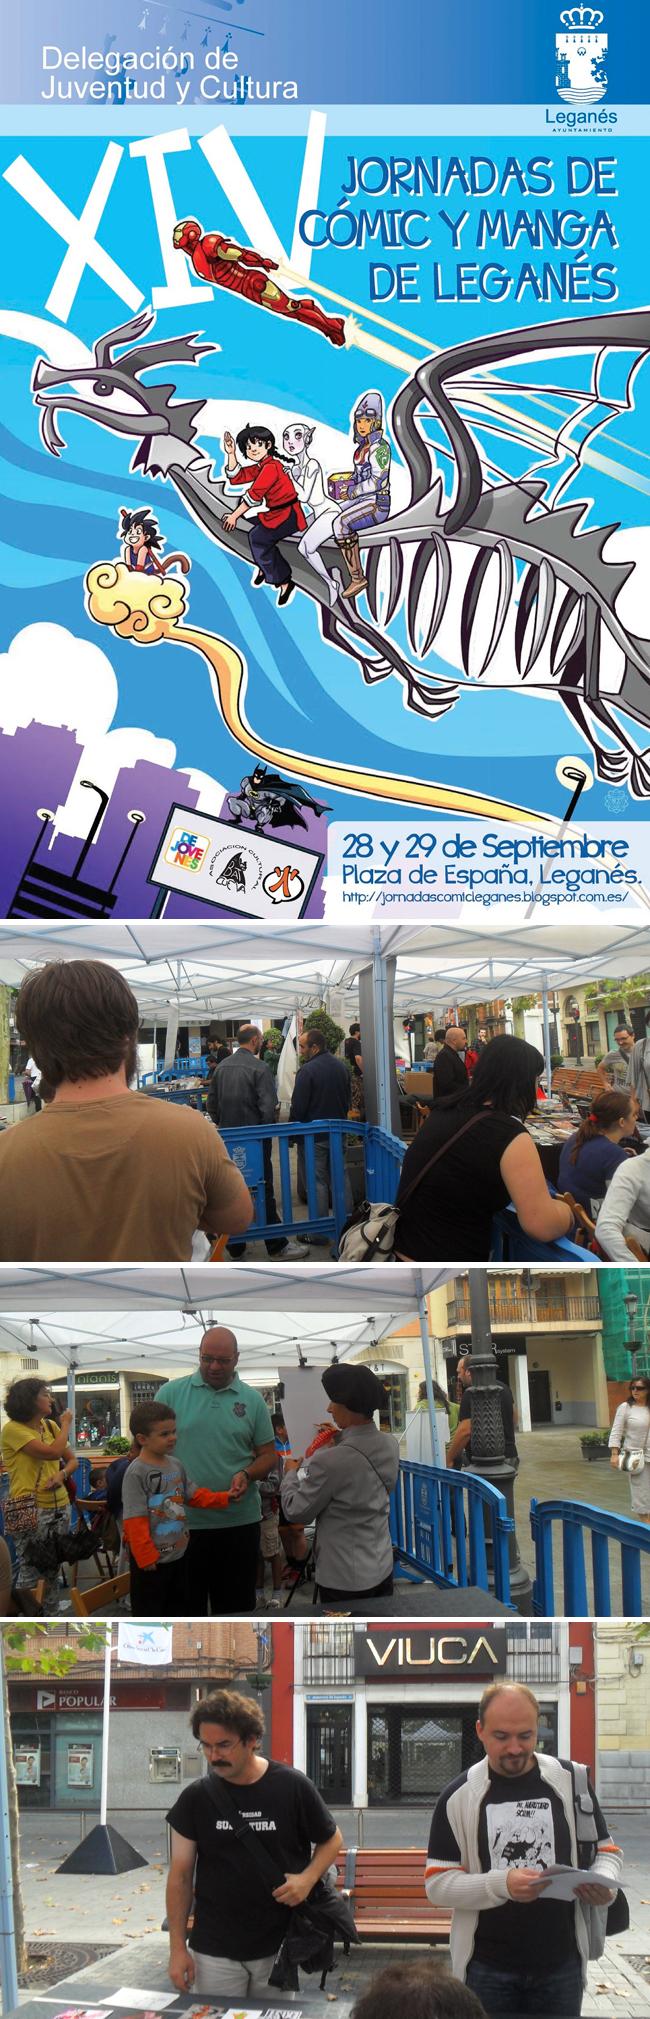 jornadas-comic-leganes-Henar-torinos-madrid-academiac10-comic